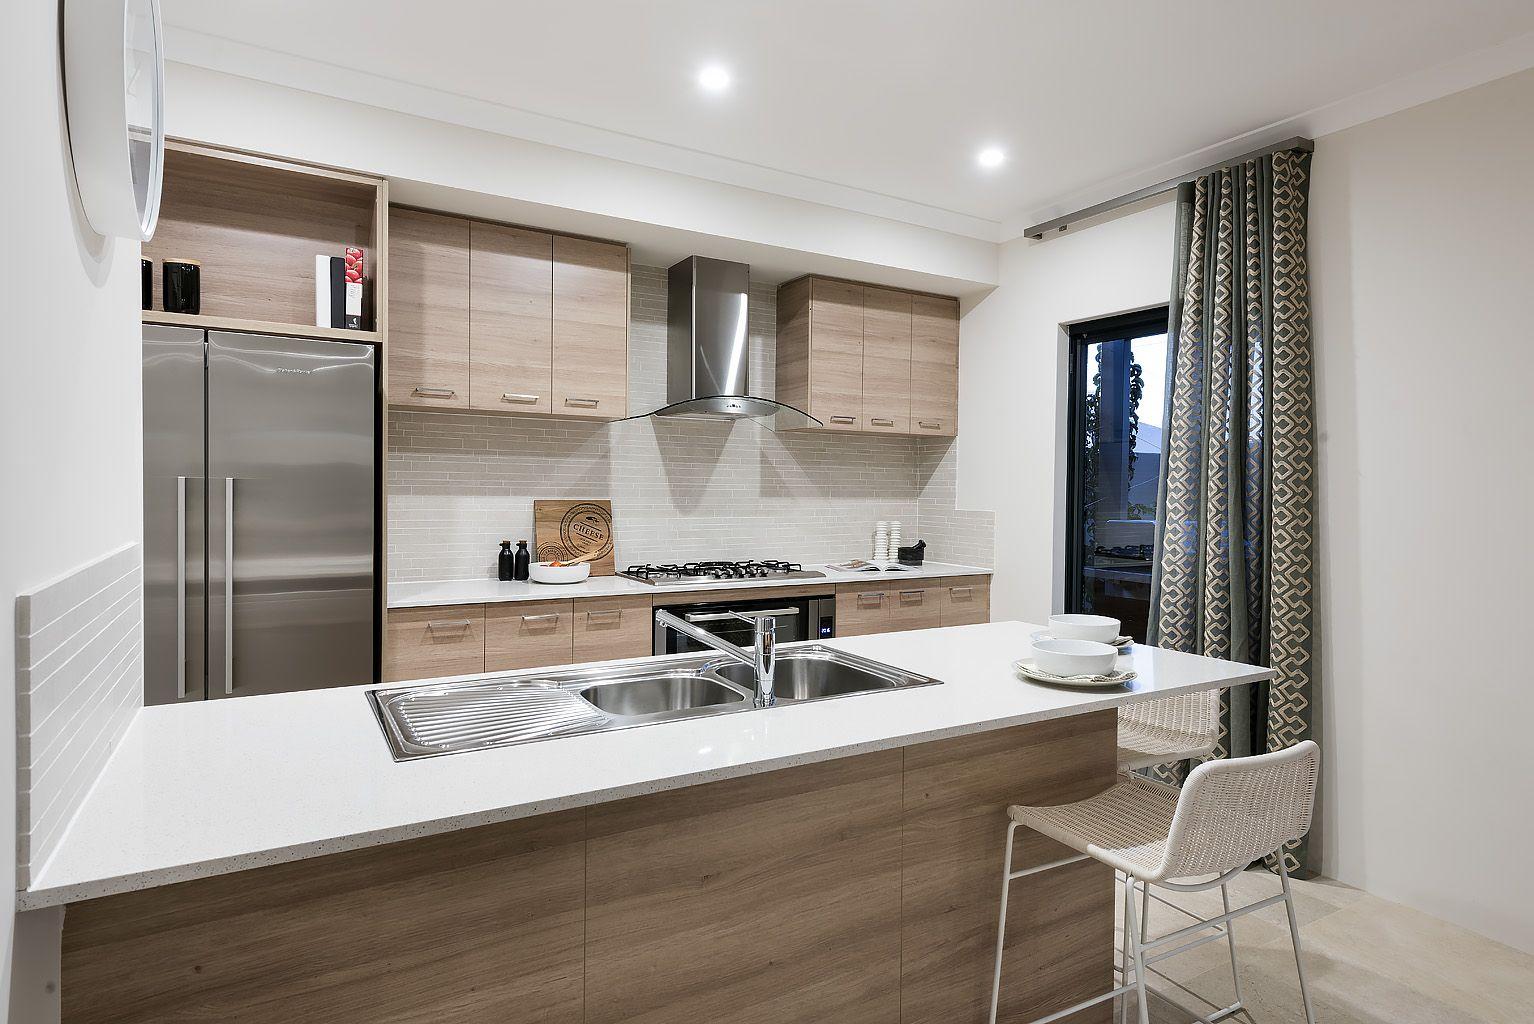 Lot 781 Gigondas Street, Provence Estate, Yalyalup WA 6280, Image 0